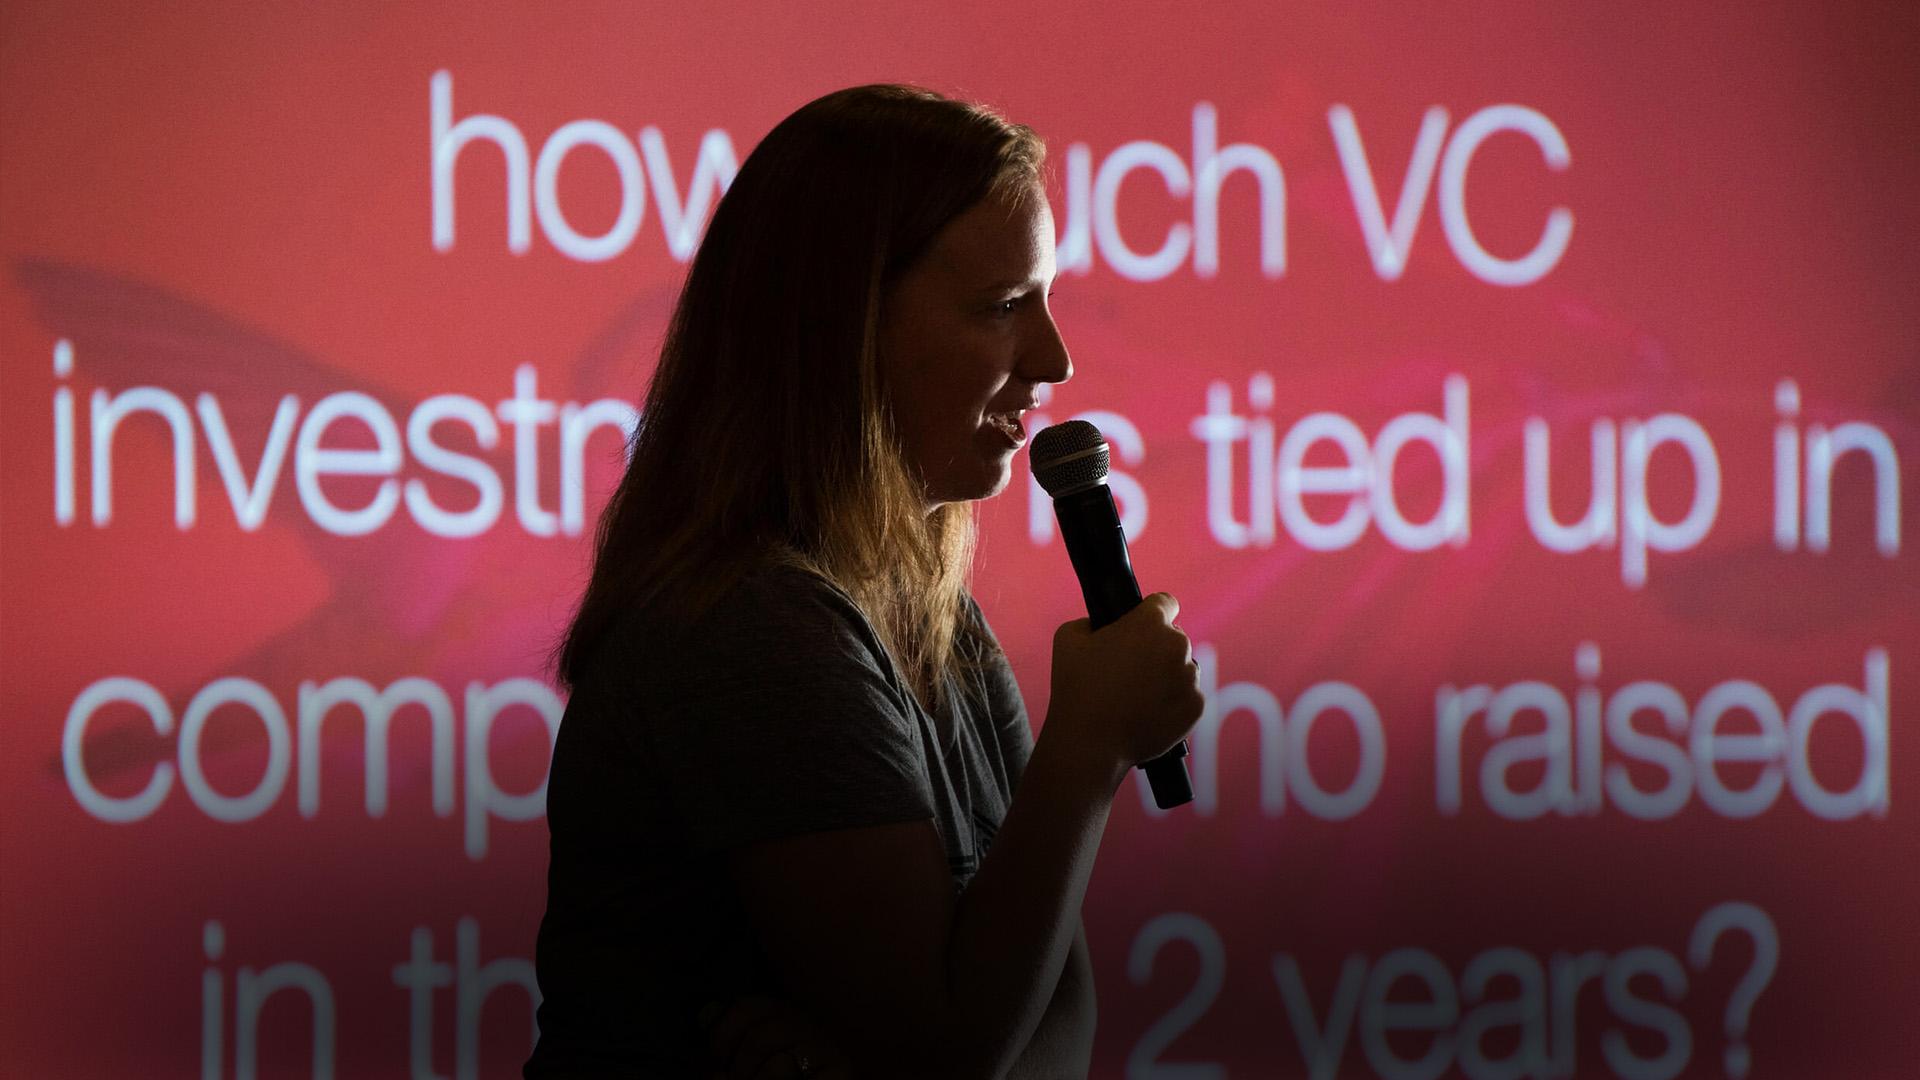 Mattermark's Danielle Morrill says More Money Chasing Fewer Deals